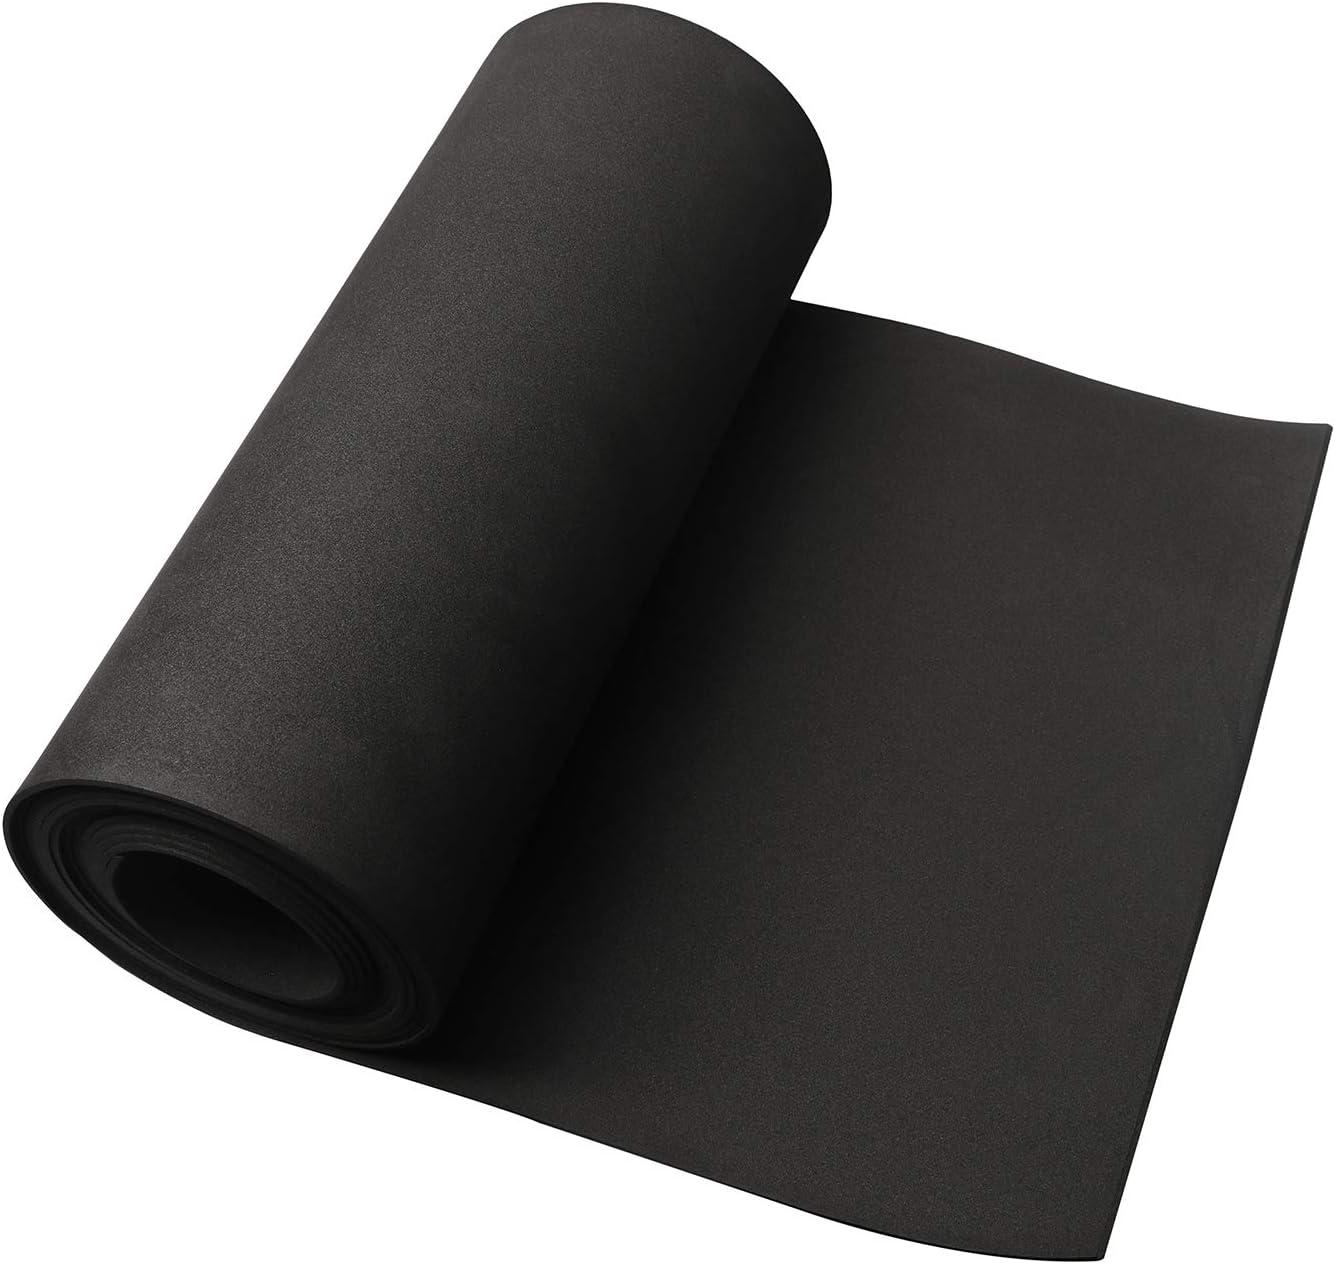 wide Makitoyo Professional Tool Box Liner and Drawer Liner x 16 feet 16 inch Foam EVA /& Rubber Tool Box Drawer Liner Mat long Non-Slip Black